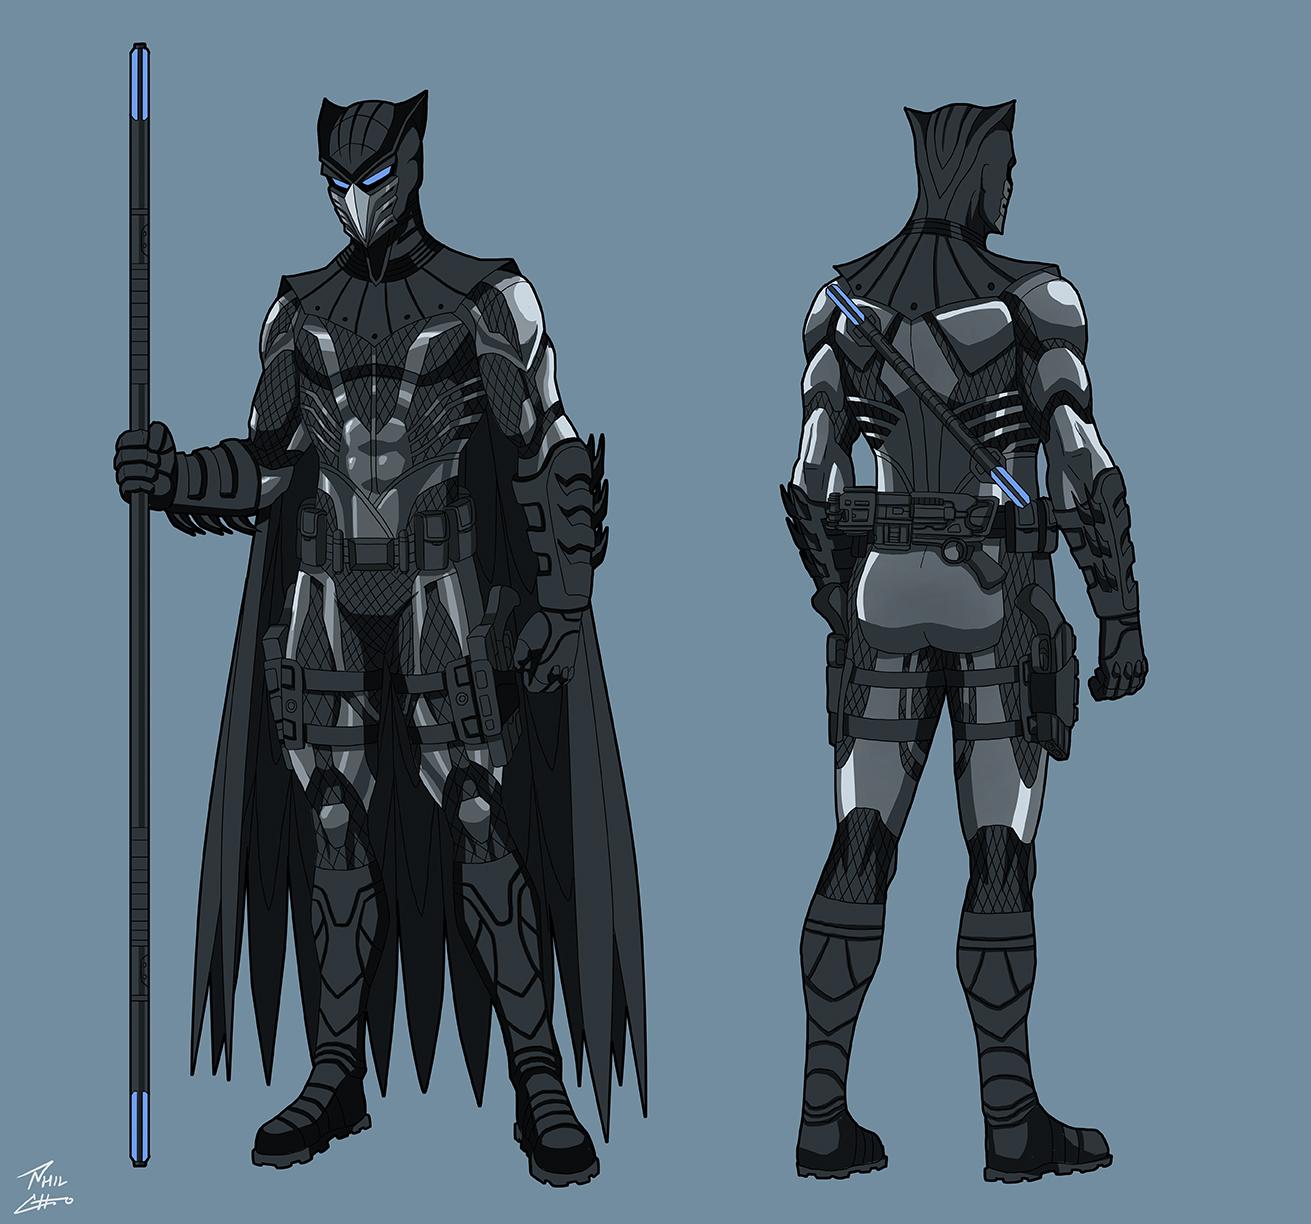 knight_owl_new_2_web.jpg